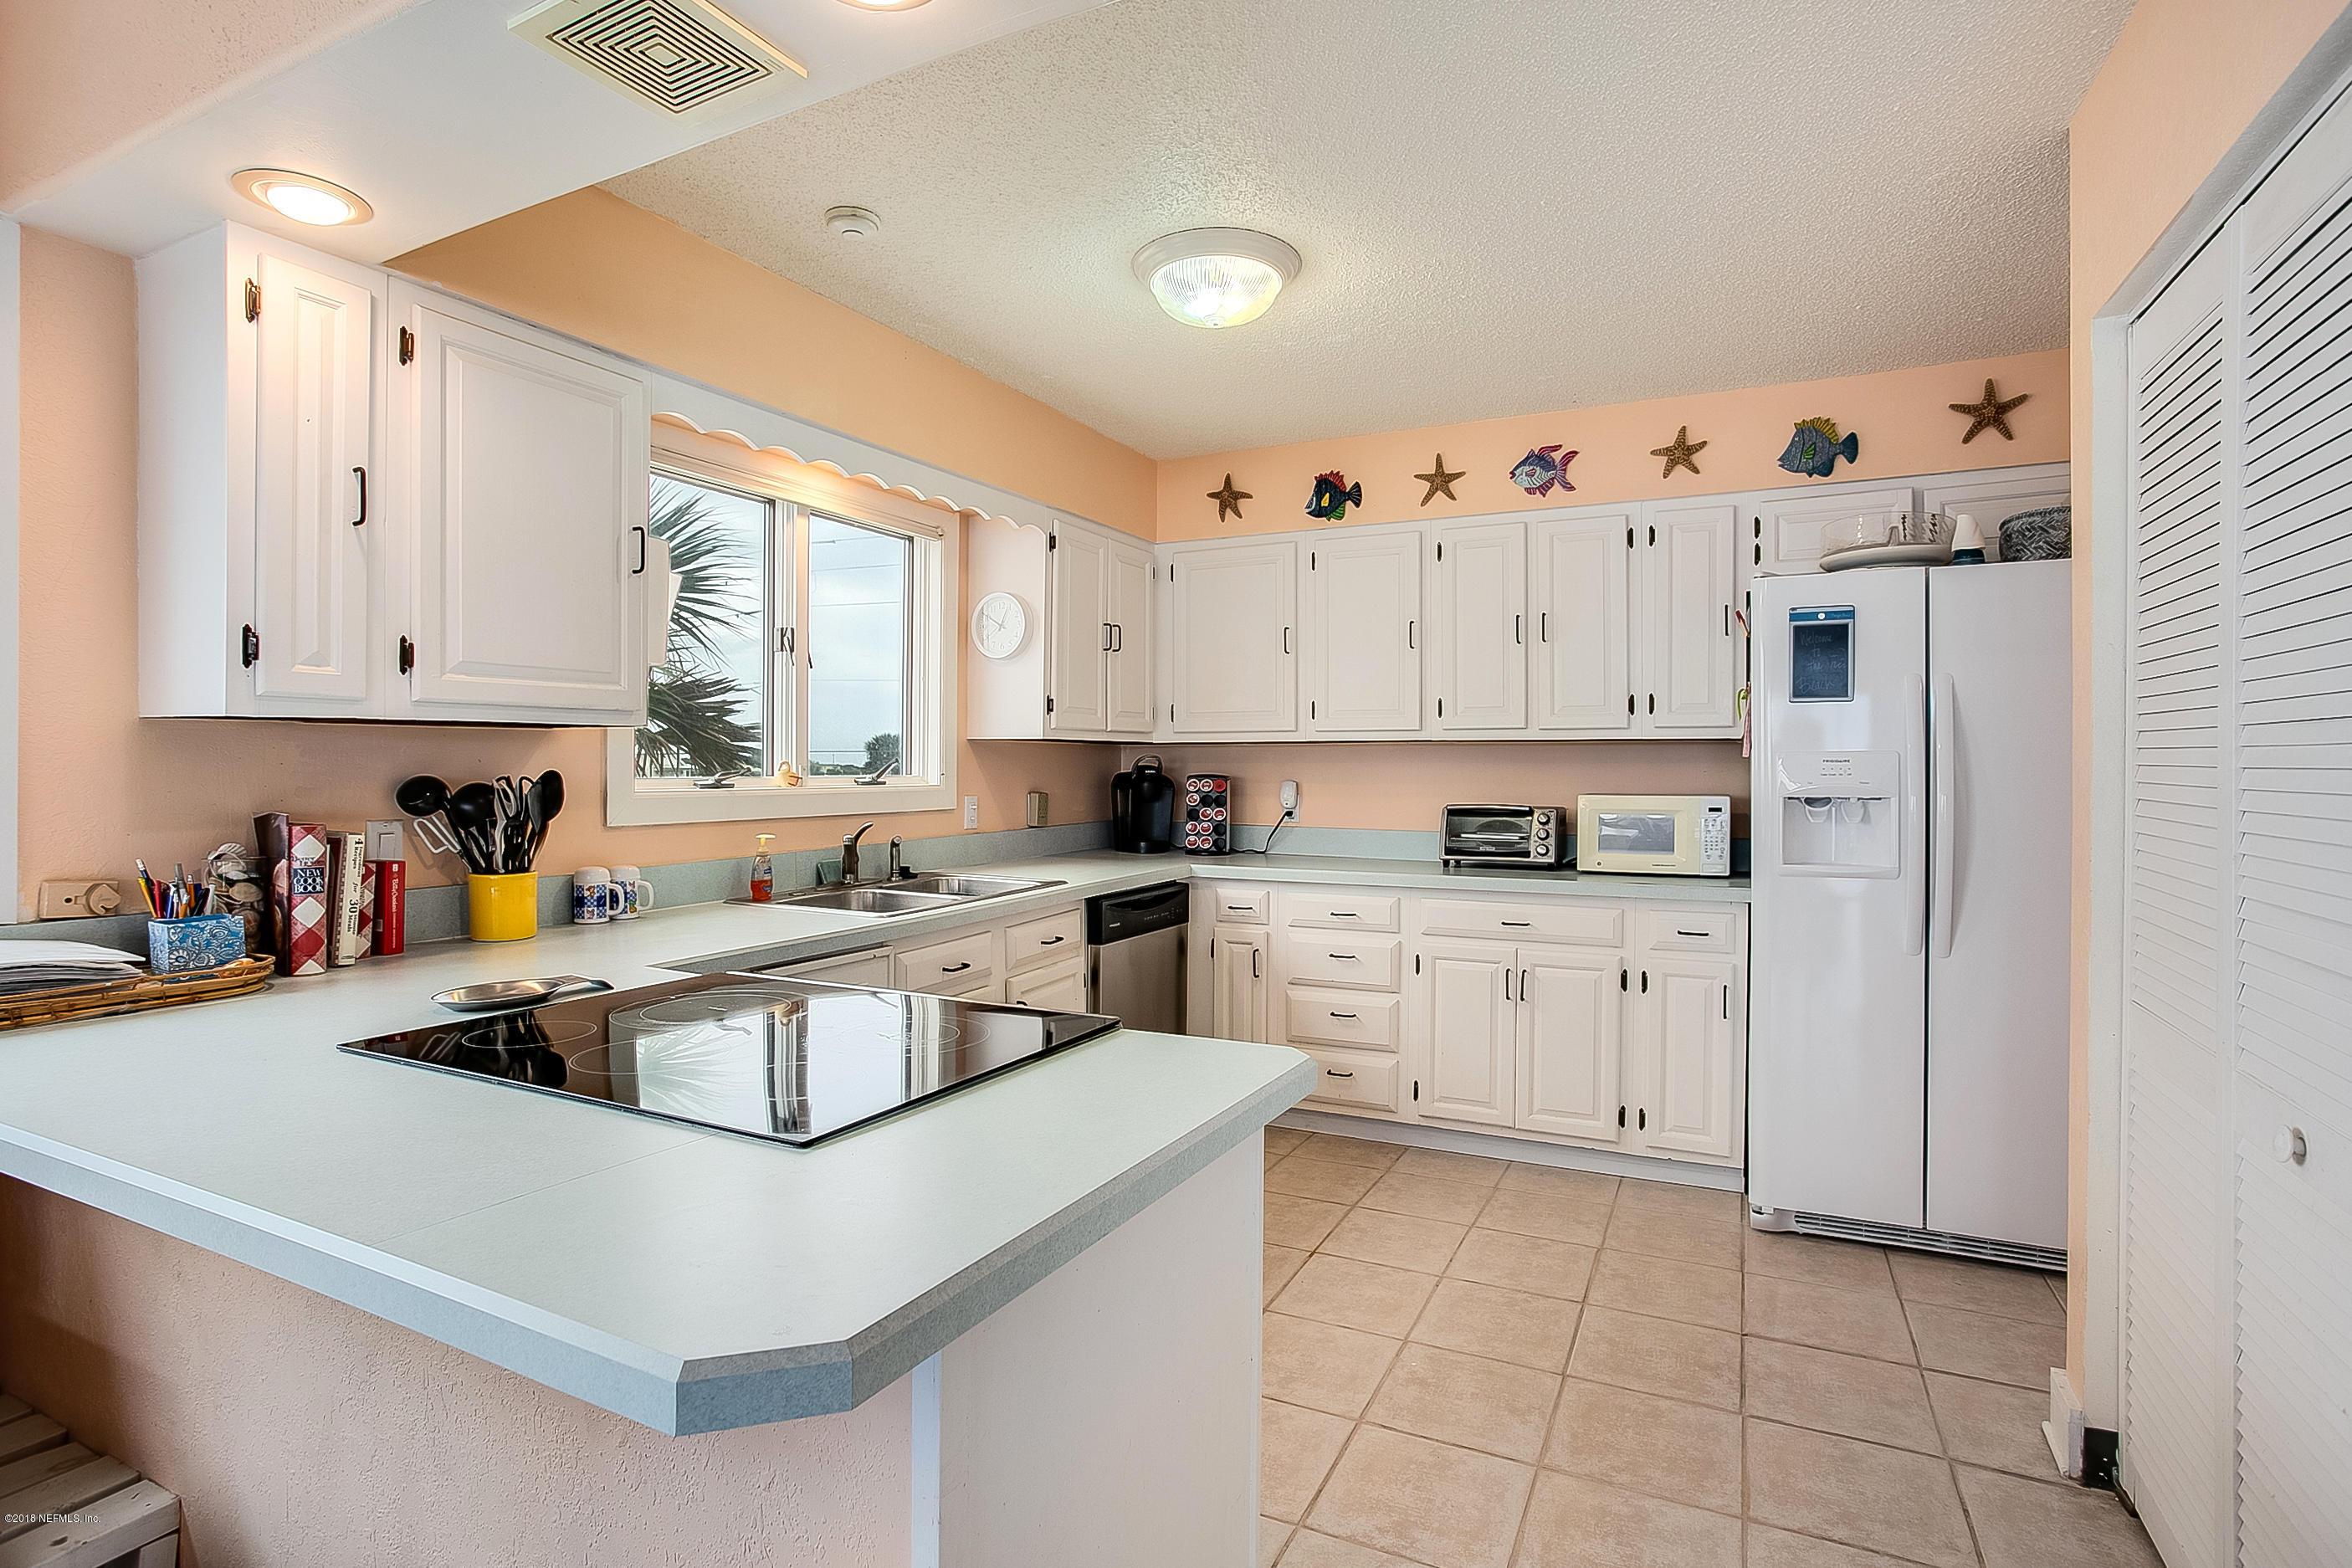 3264 COASTAL, ST AUGUSTINE, FLORIDA 32084, 3 Bedrooms Bedrooms, ,3 BathroomsBathrooms,Residential - single family,For sale,COASTAL,964122